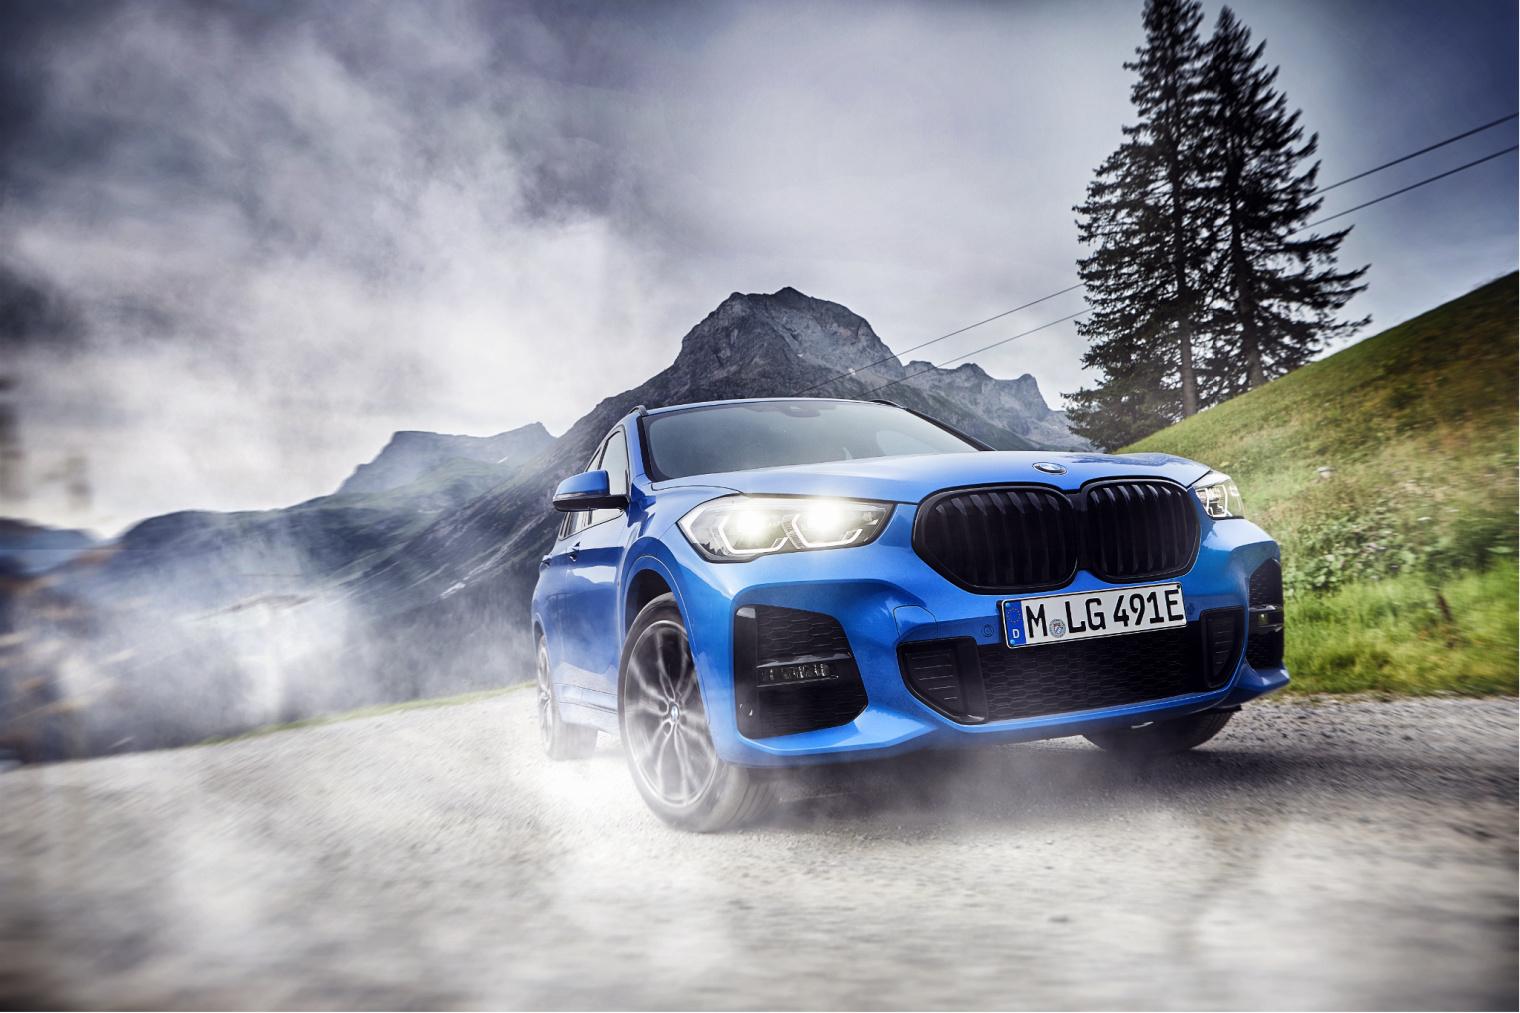 Nuova BMW X1 ibrida plug-in 2020 dinamica